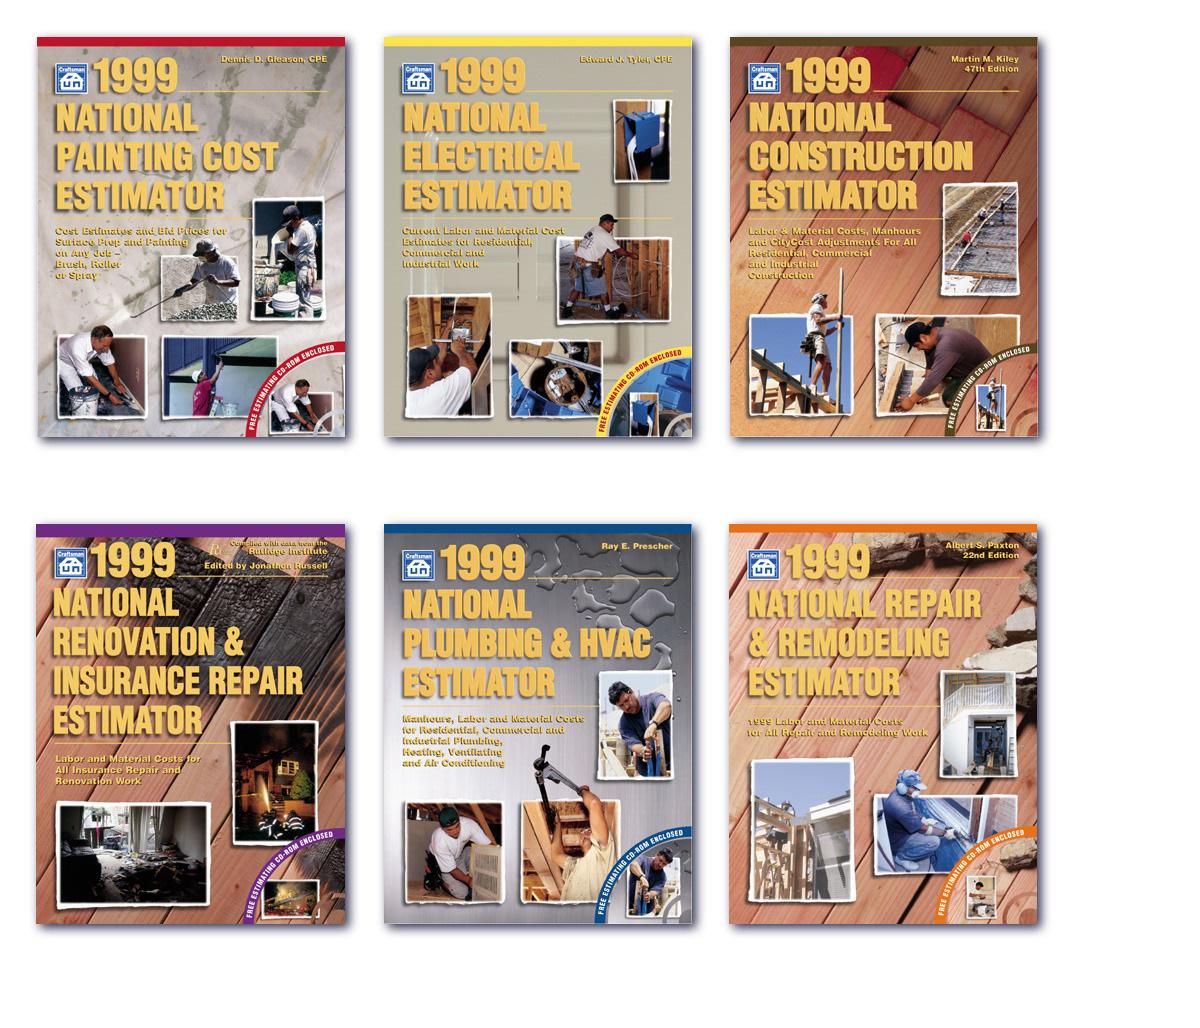 Merritt Voigtlander - 1999 Estimator Covers